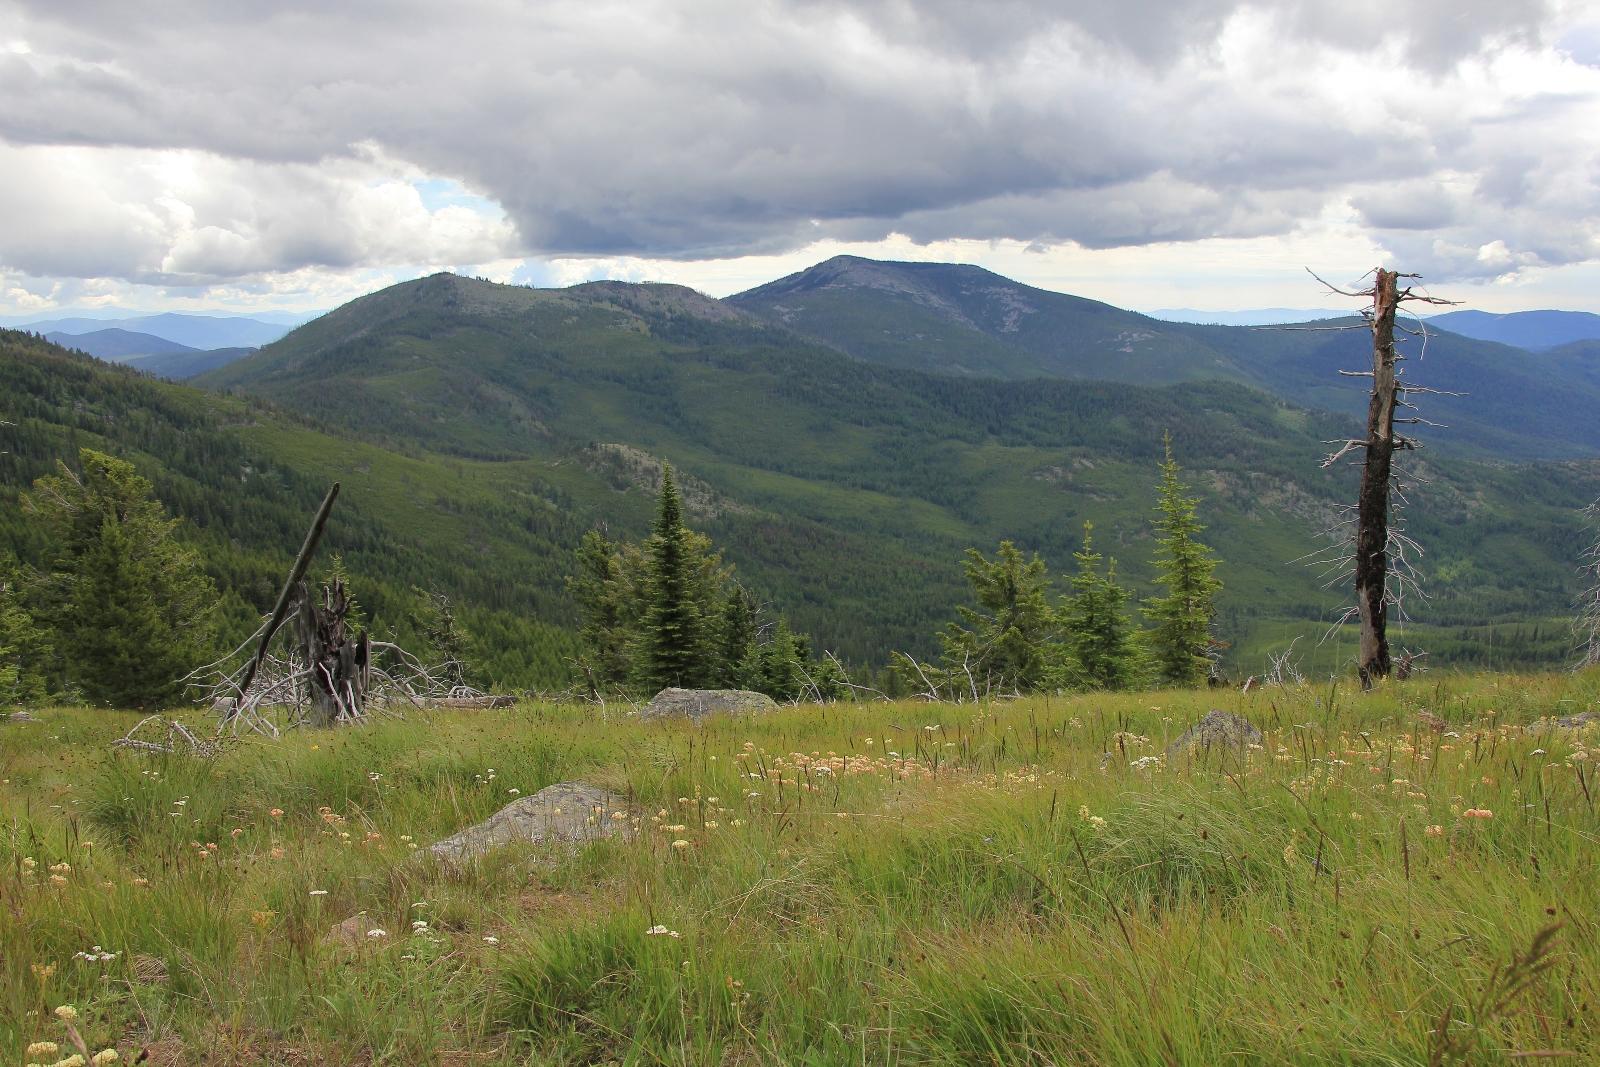 07-10-16-edds-mountain-64